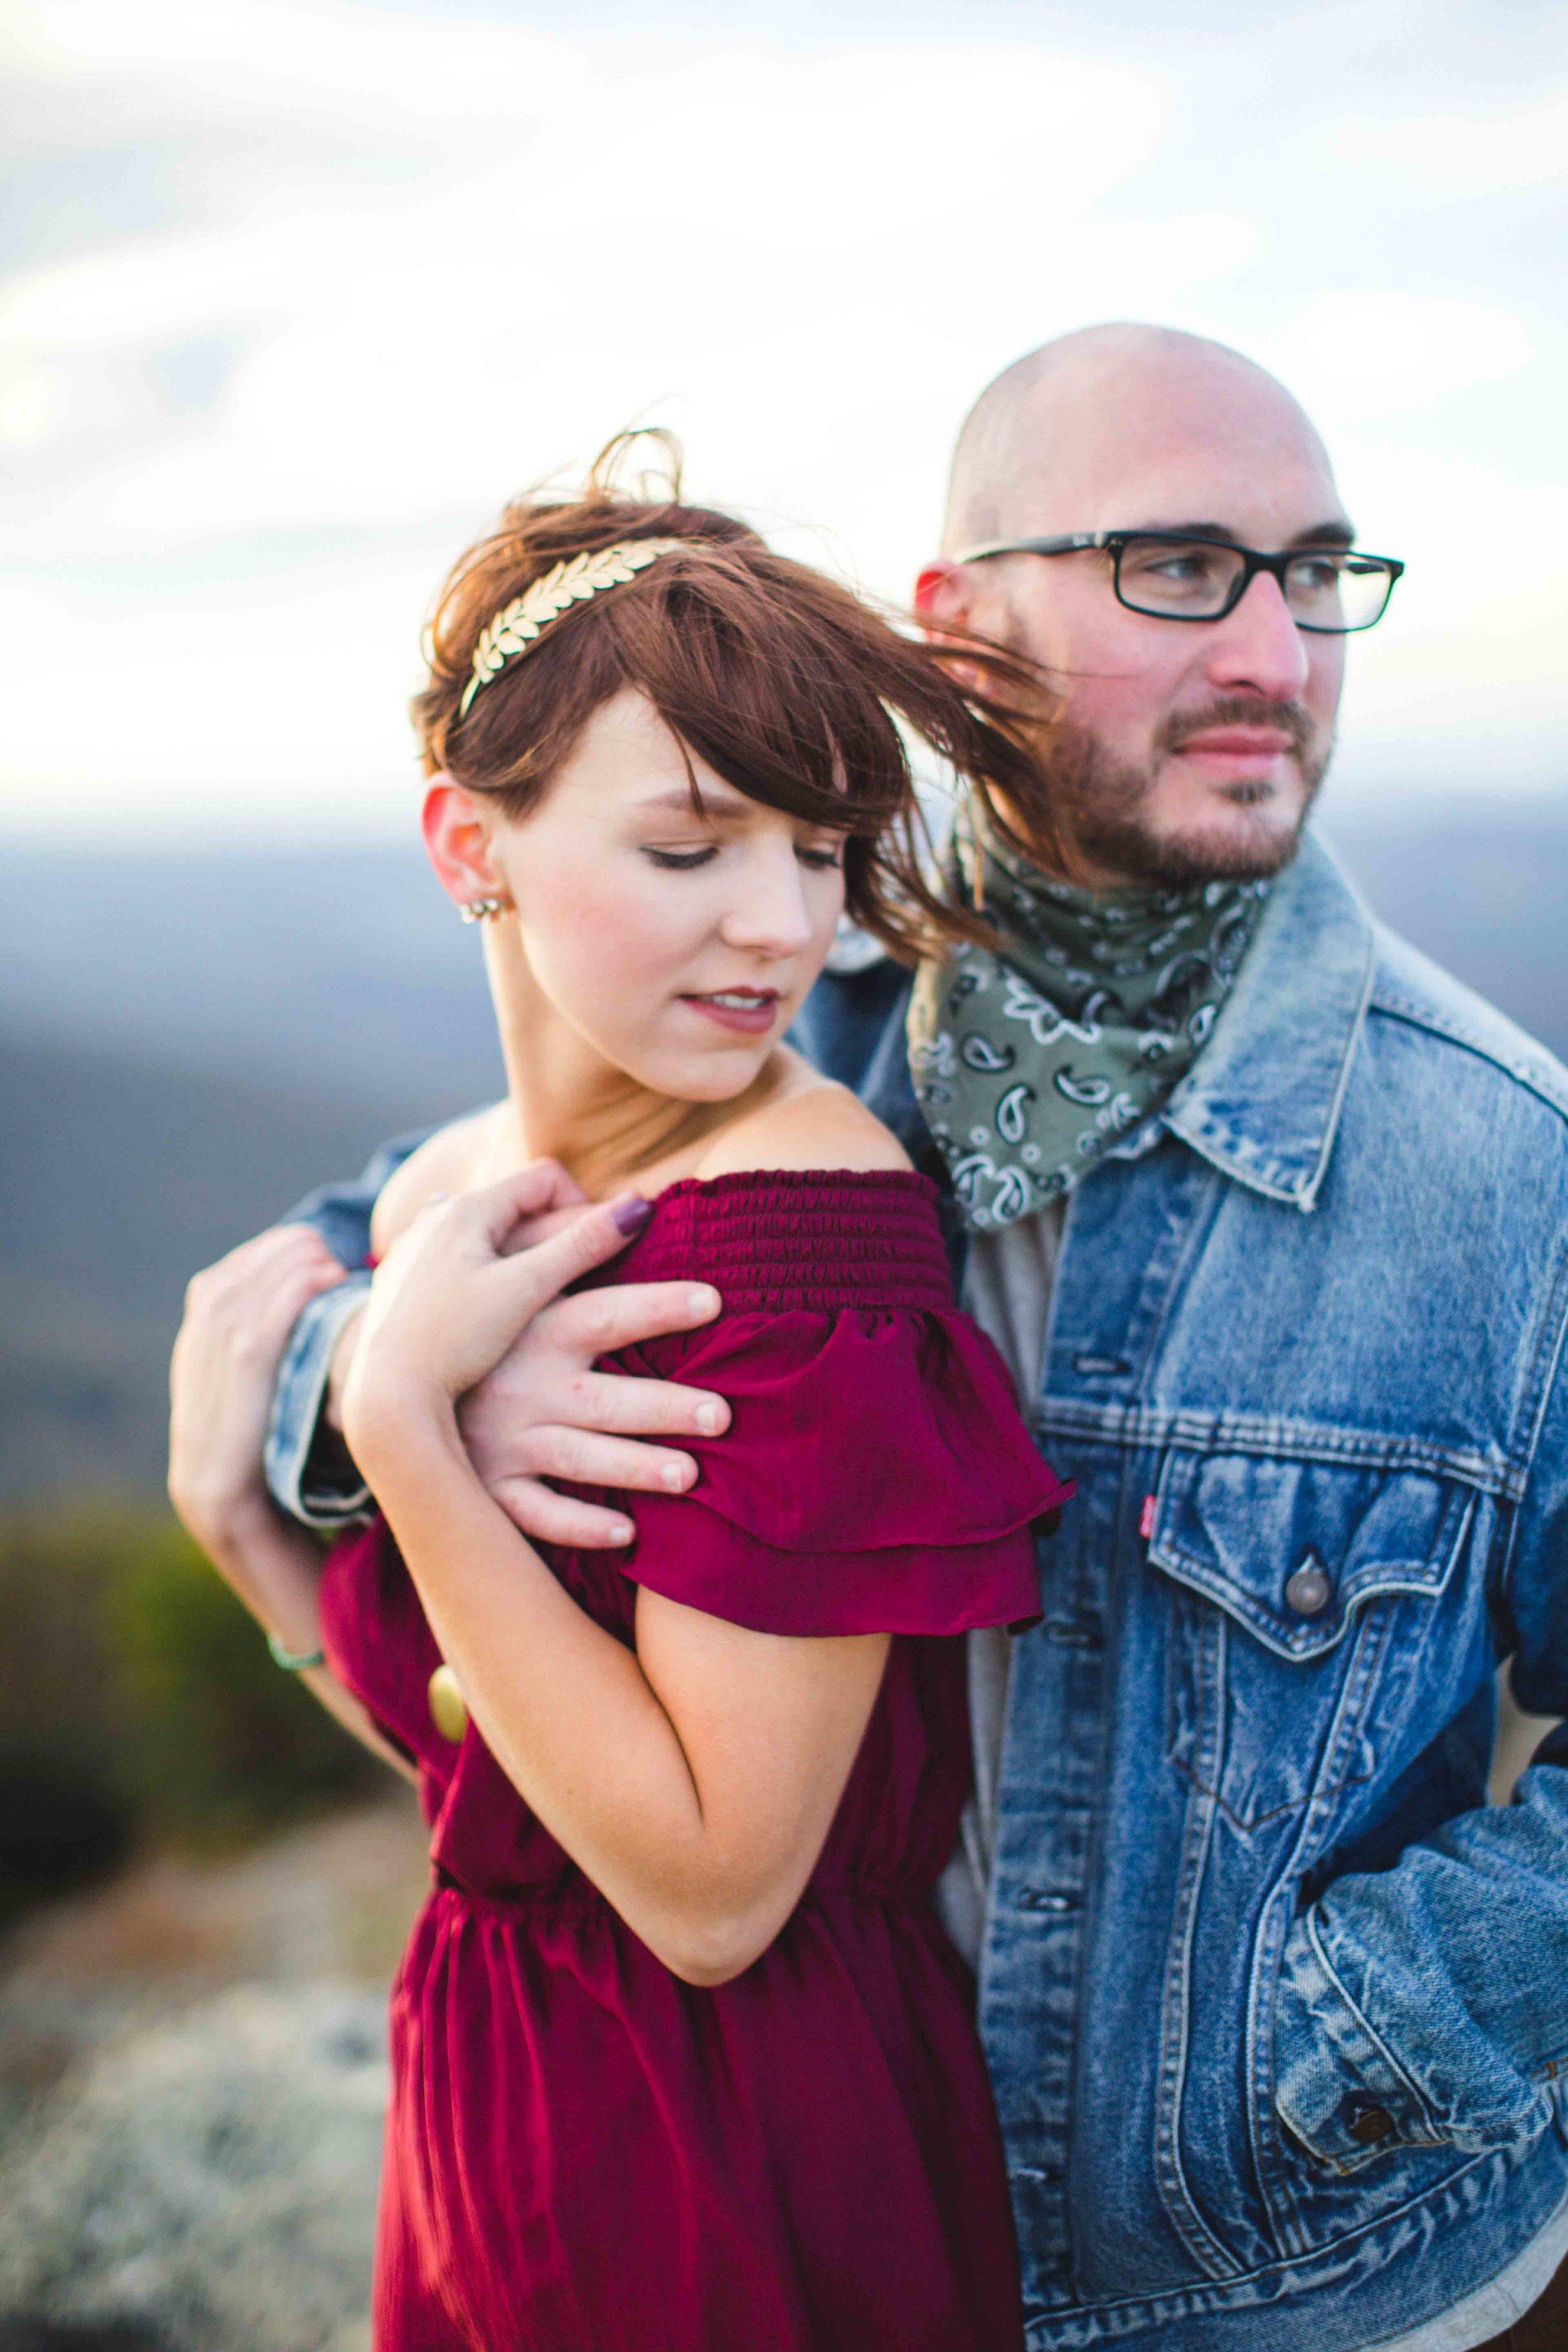 north-carolina-elopement-photographer-23.jpg